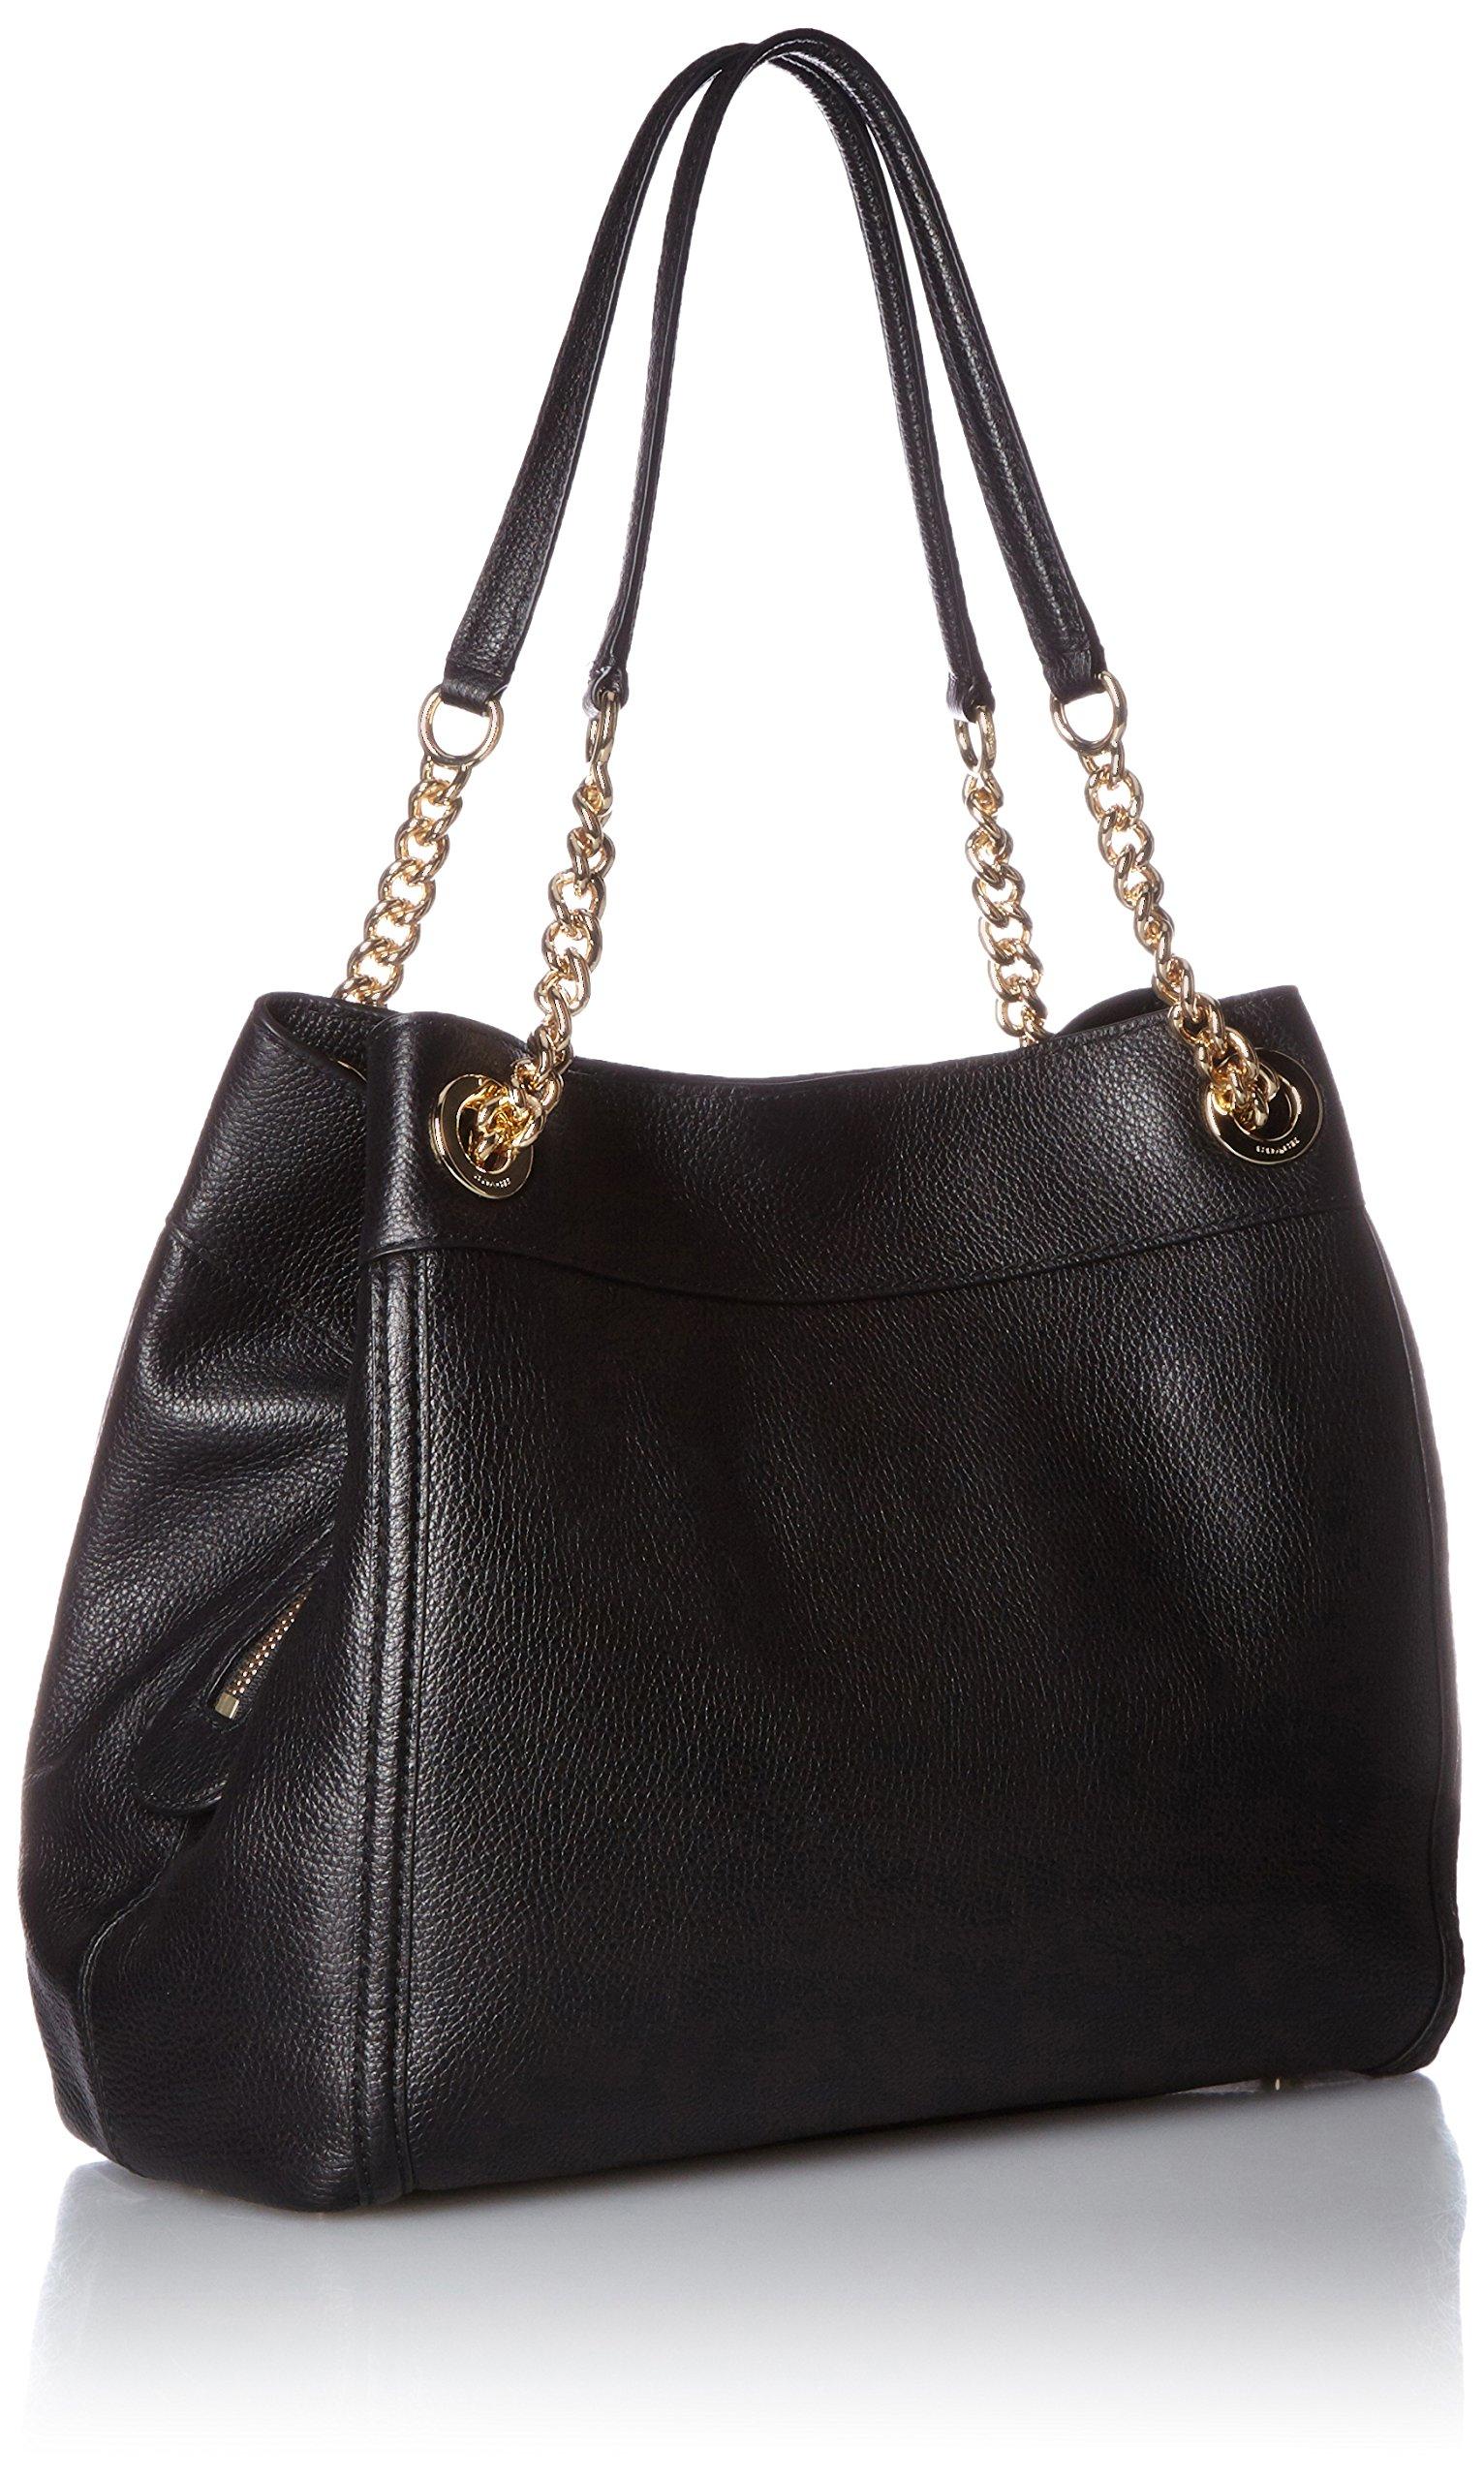 COACH Women's Turnlock Edie LI/Black Shoulder Bag by Coach (Image #2)